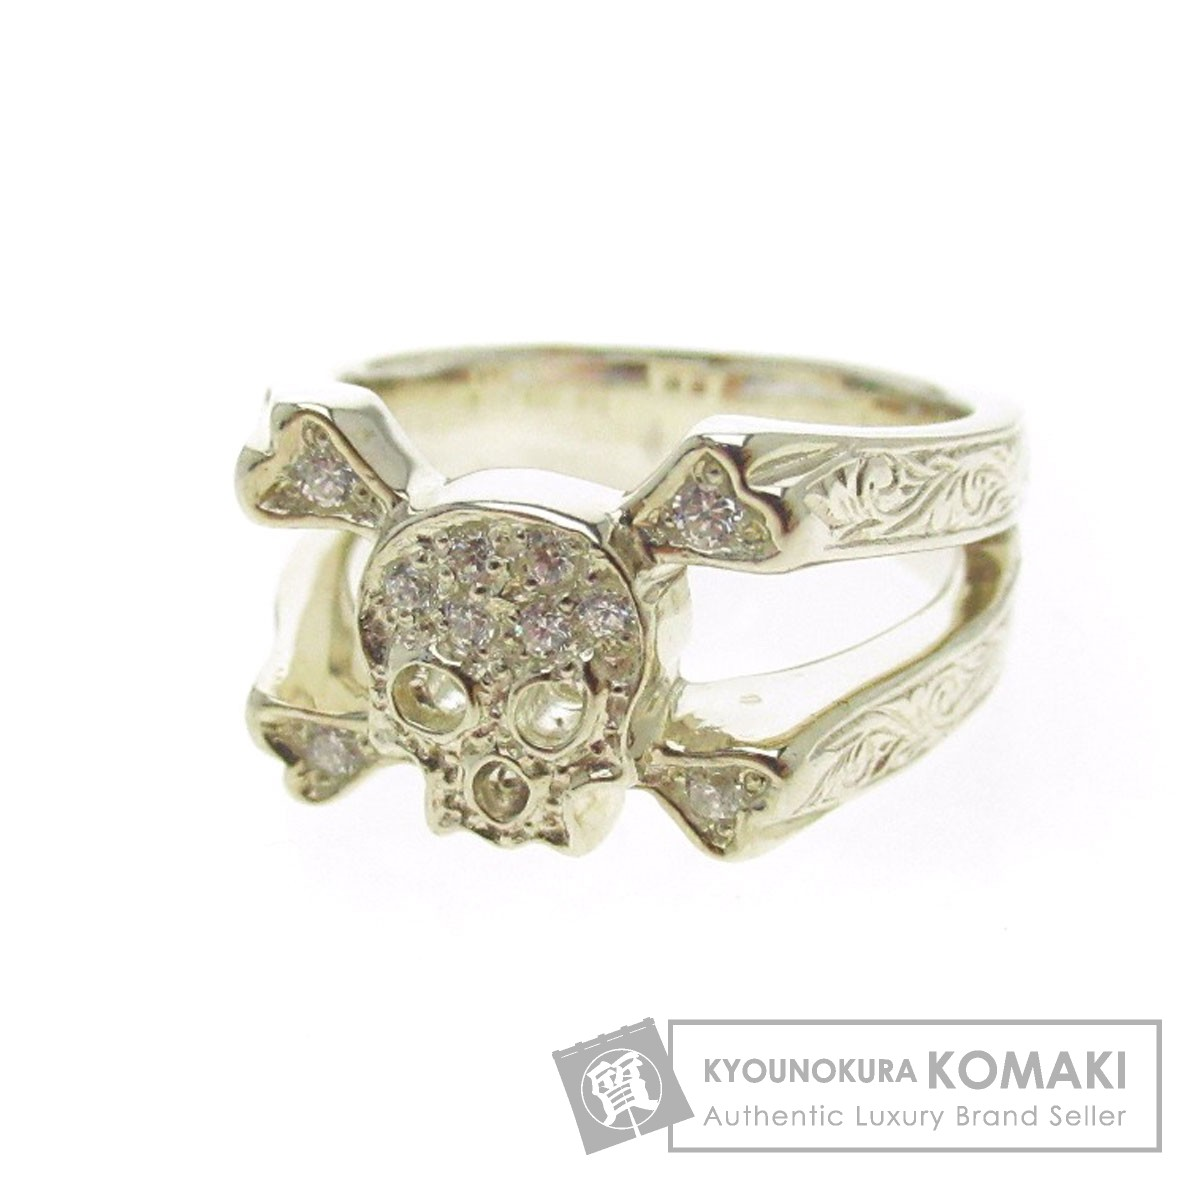 Loree Rodkin R6811A-886 スカル リング・指輪 シルバー メンズ 【中古】【ローリーロドキン】